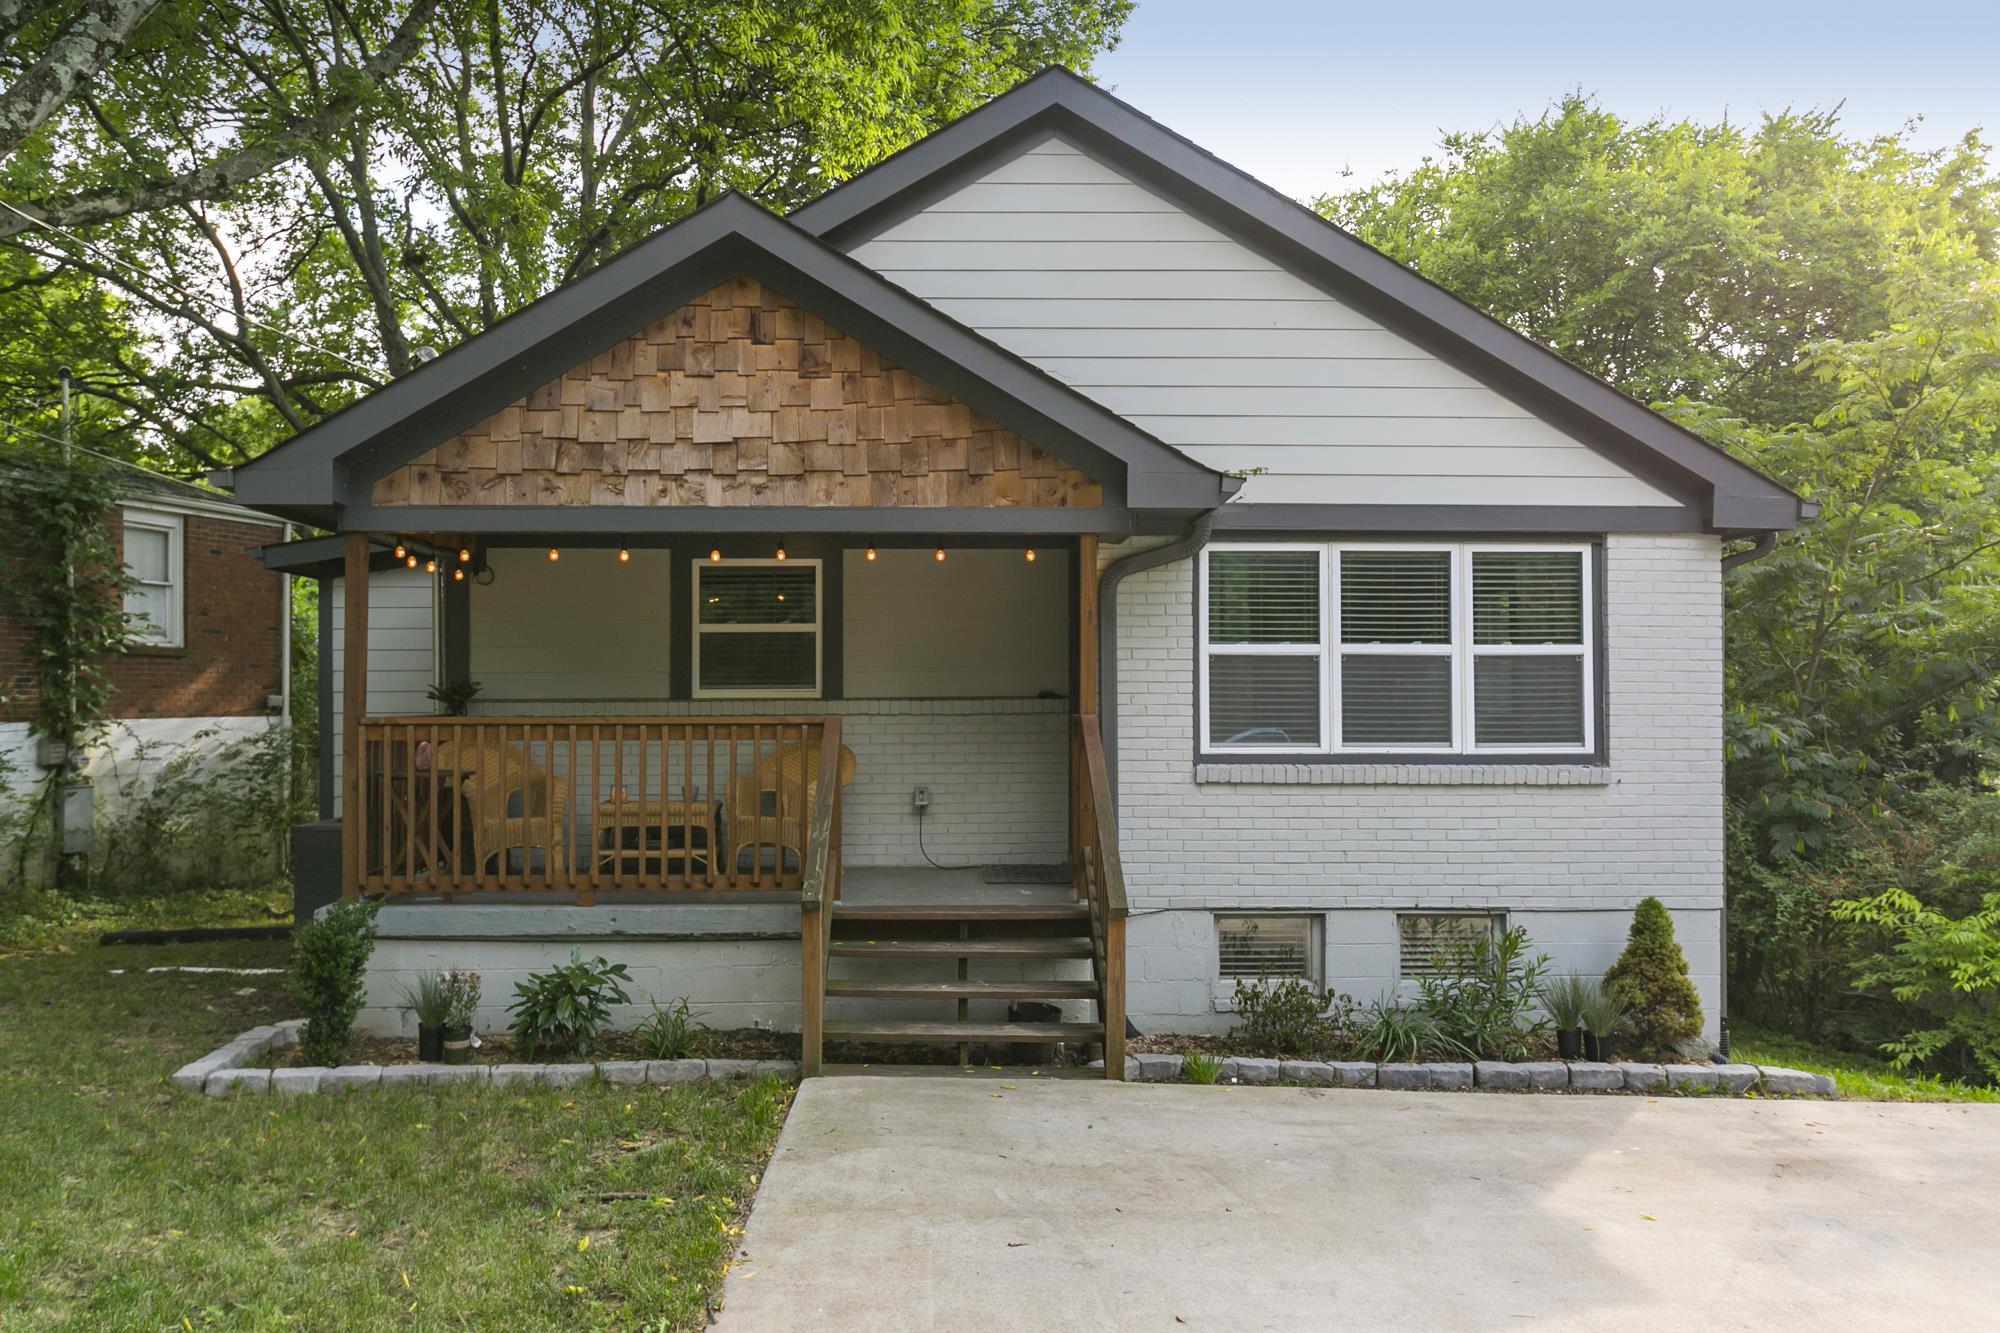 2824 Jones Ave, Nashville, TN 37207 - Nashville, TN real estate listing